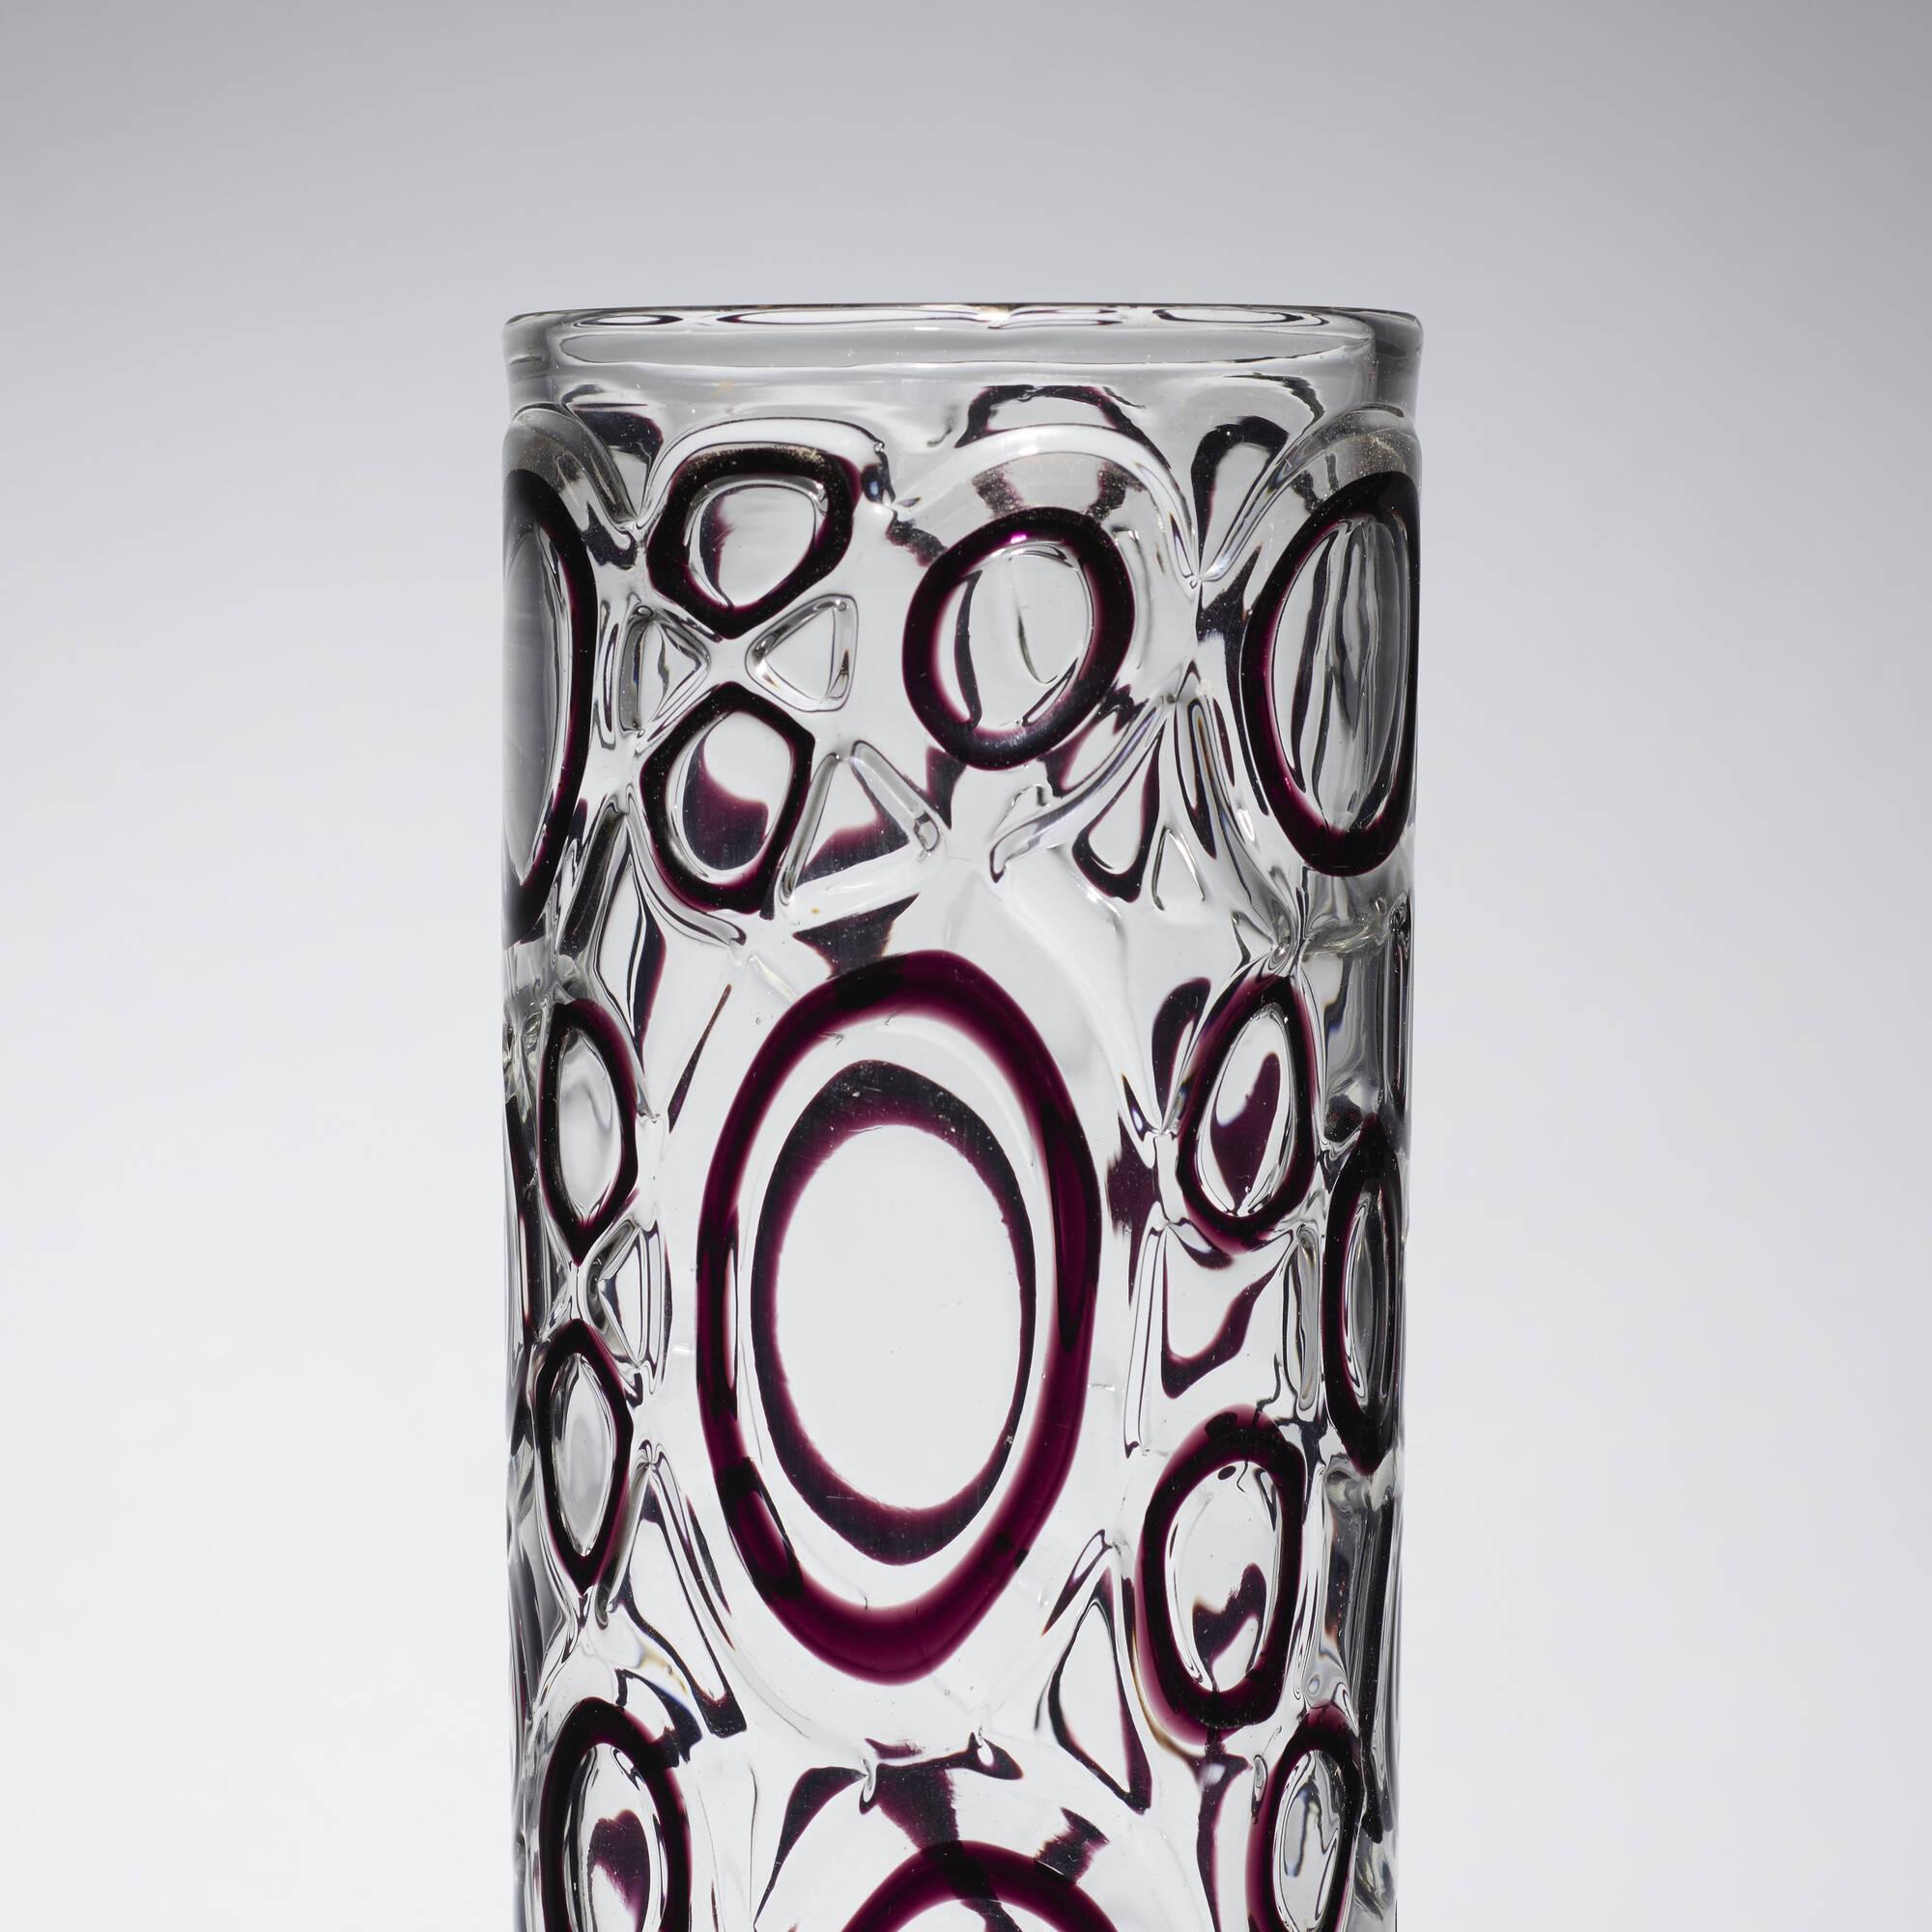 177: Ercole Barovier / Sidereo vase (2 of 2)